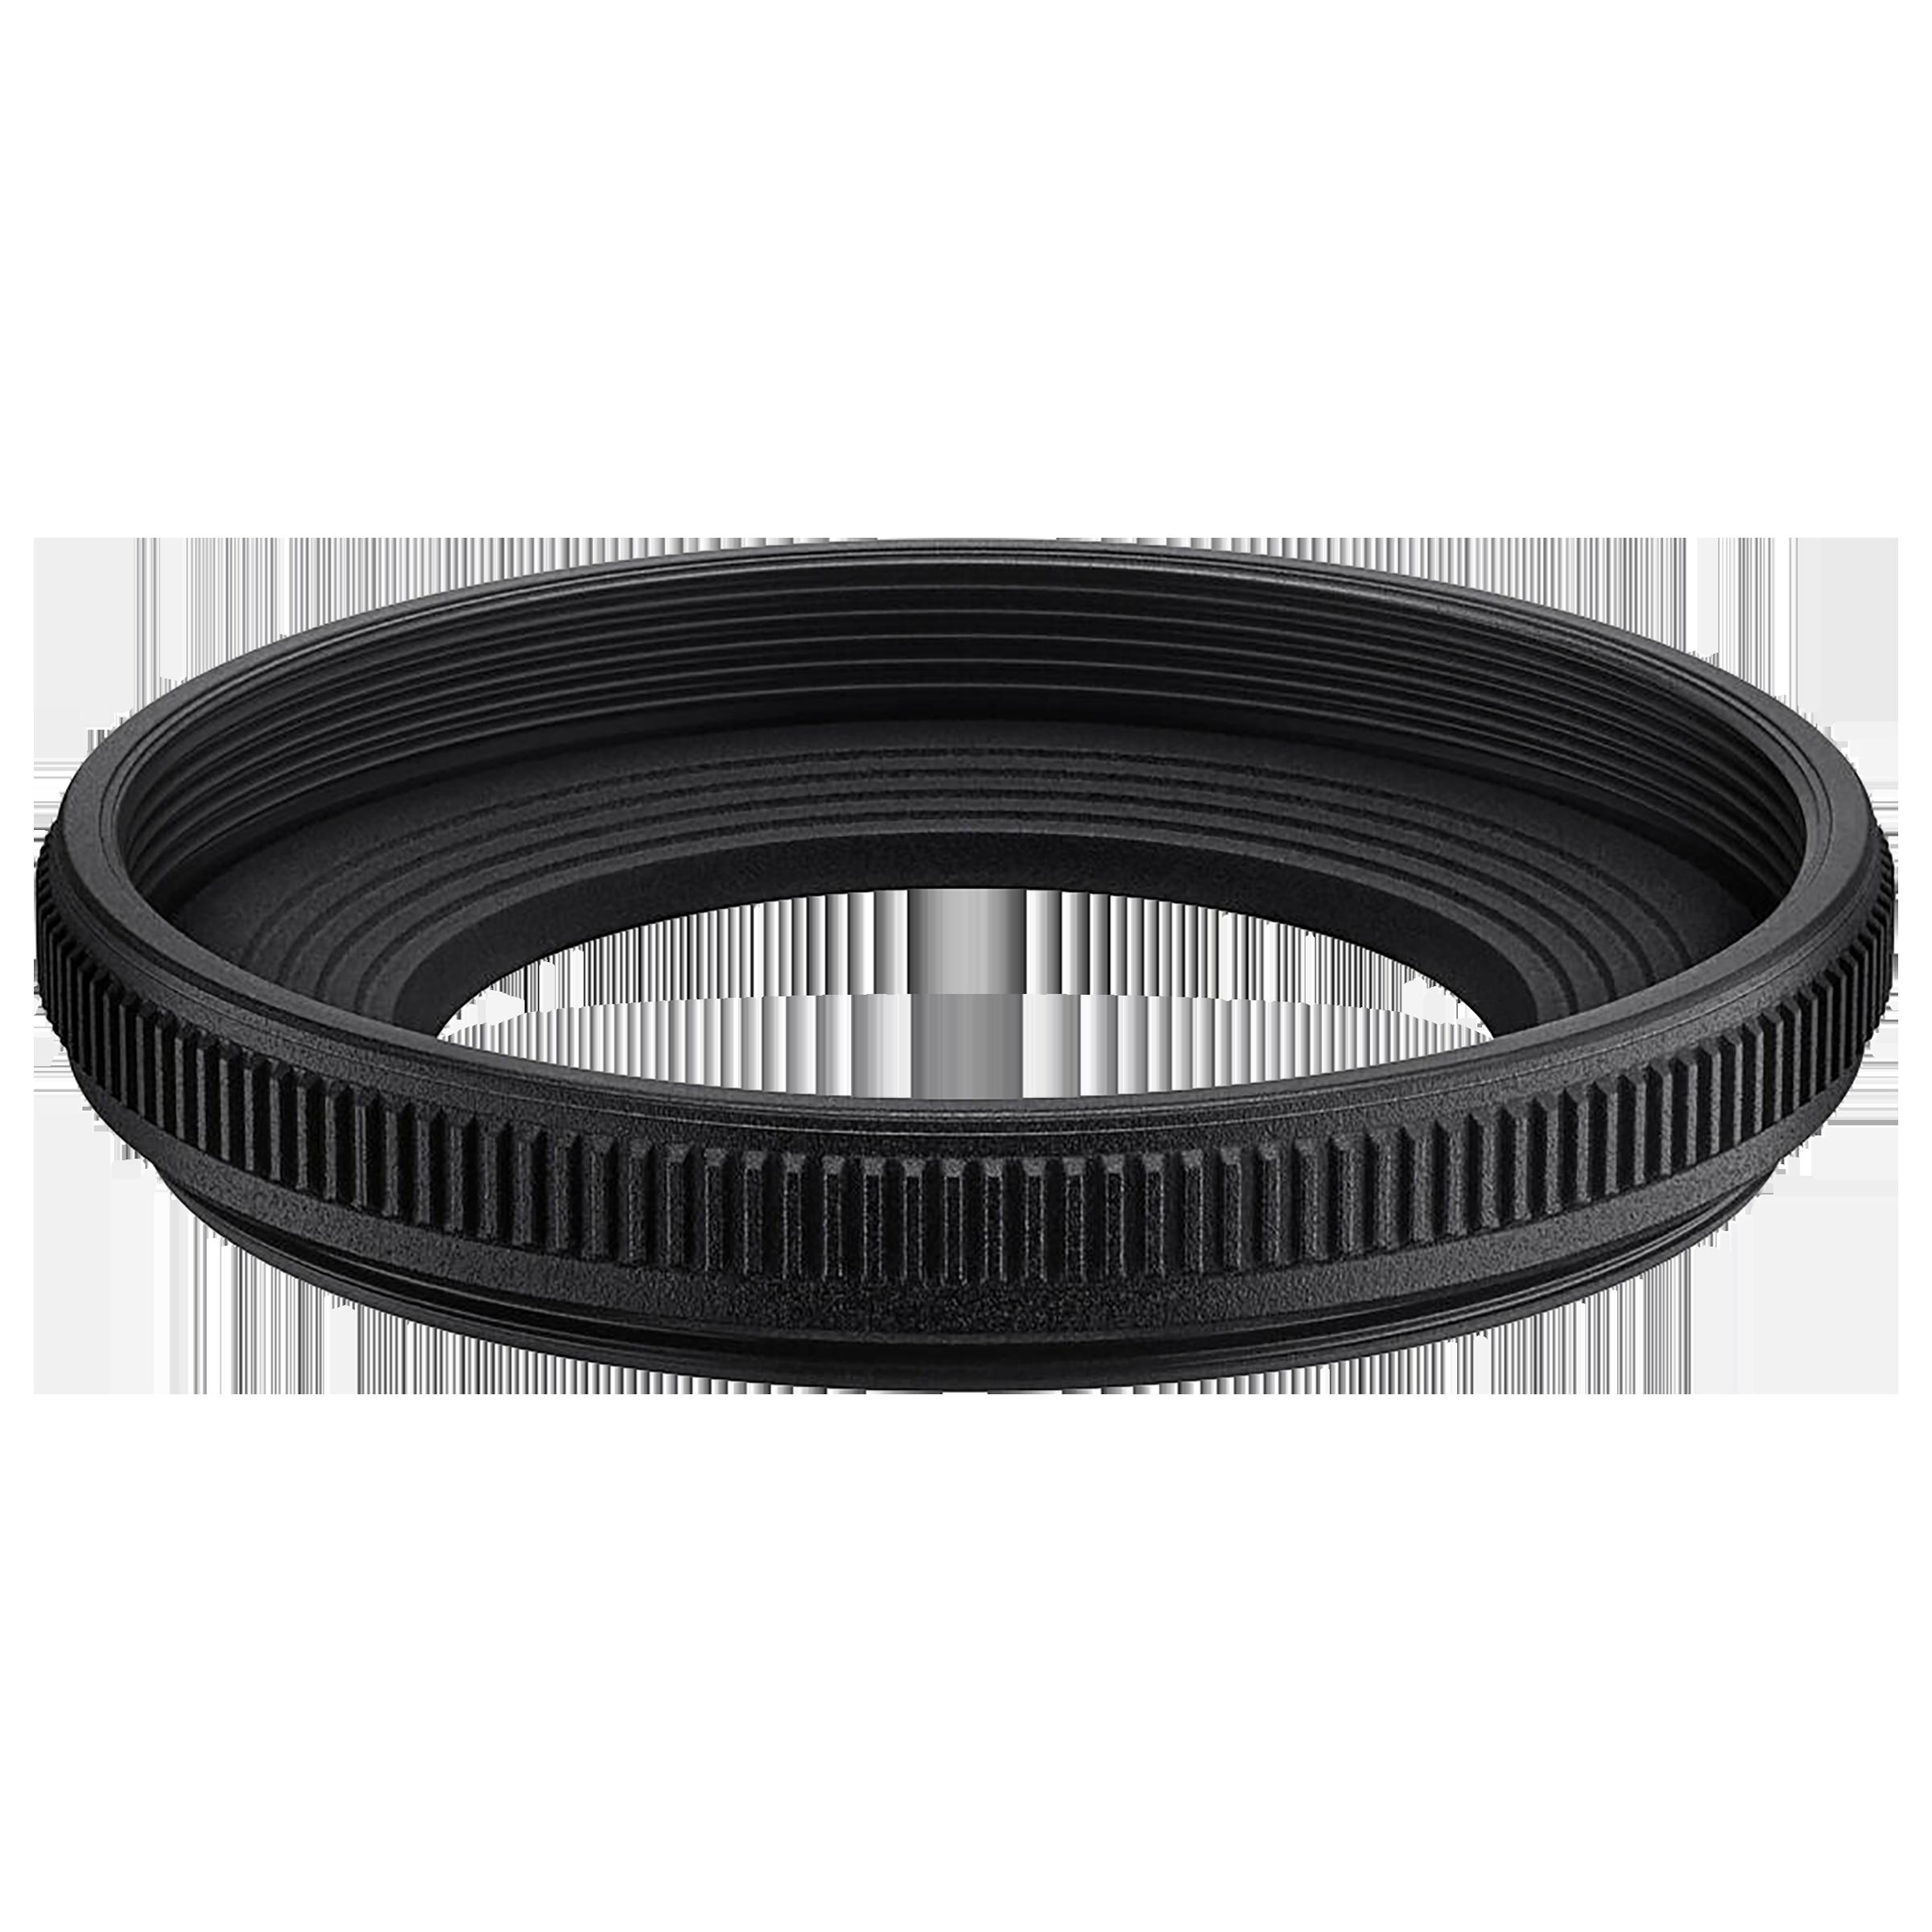 Lens - Nikon Nikkor Z MC 50mm f/2.850 mm F22-F2.8 Macro Lens (1:1 Magnification, JMA603DA, Black)_4